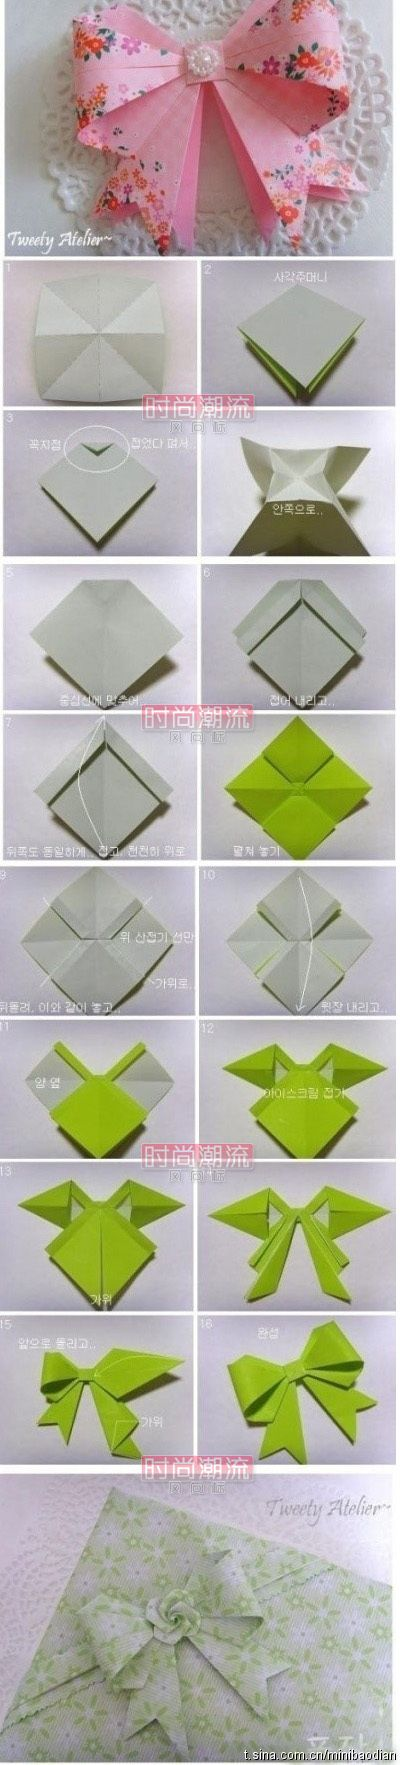 Оригами бантик  http://tiny-tanny.mmm-tasty.ru/entries/10033033